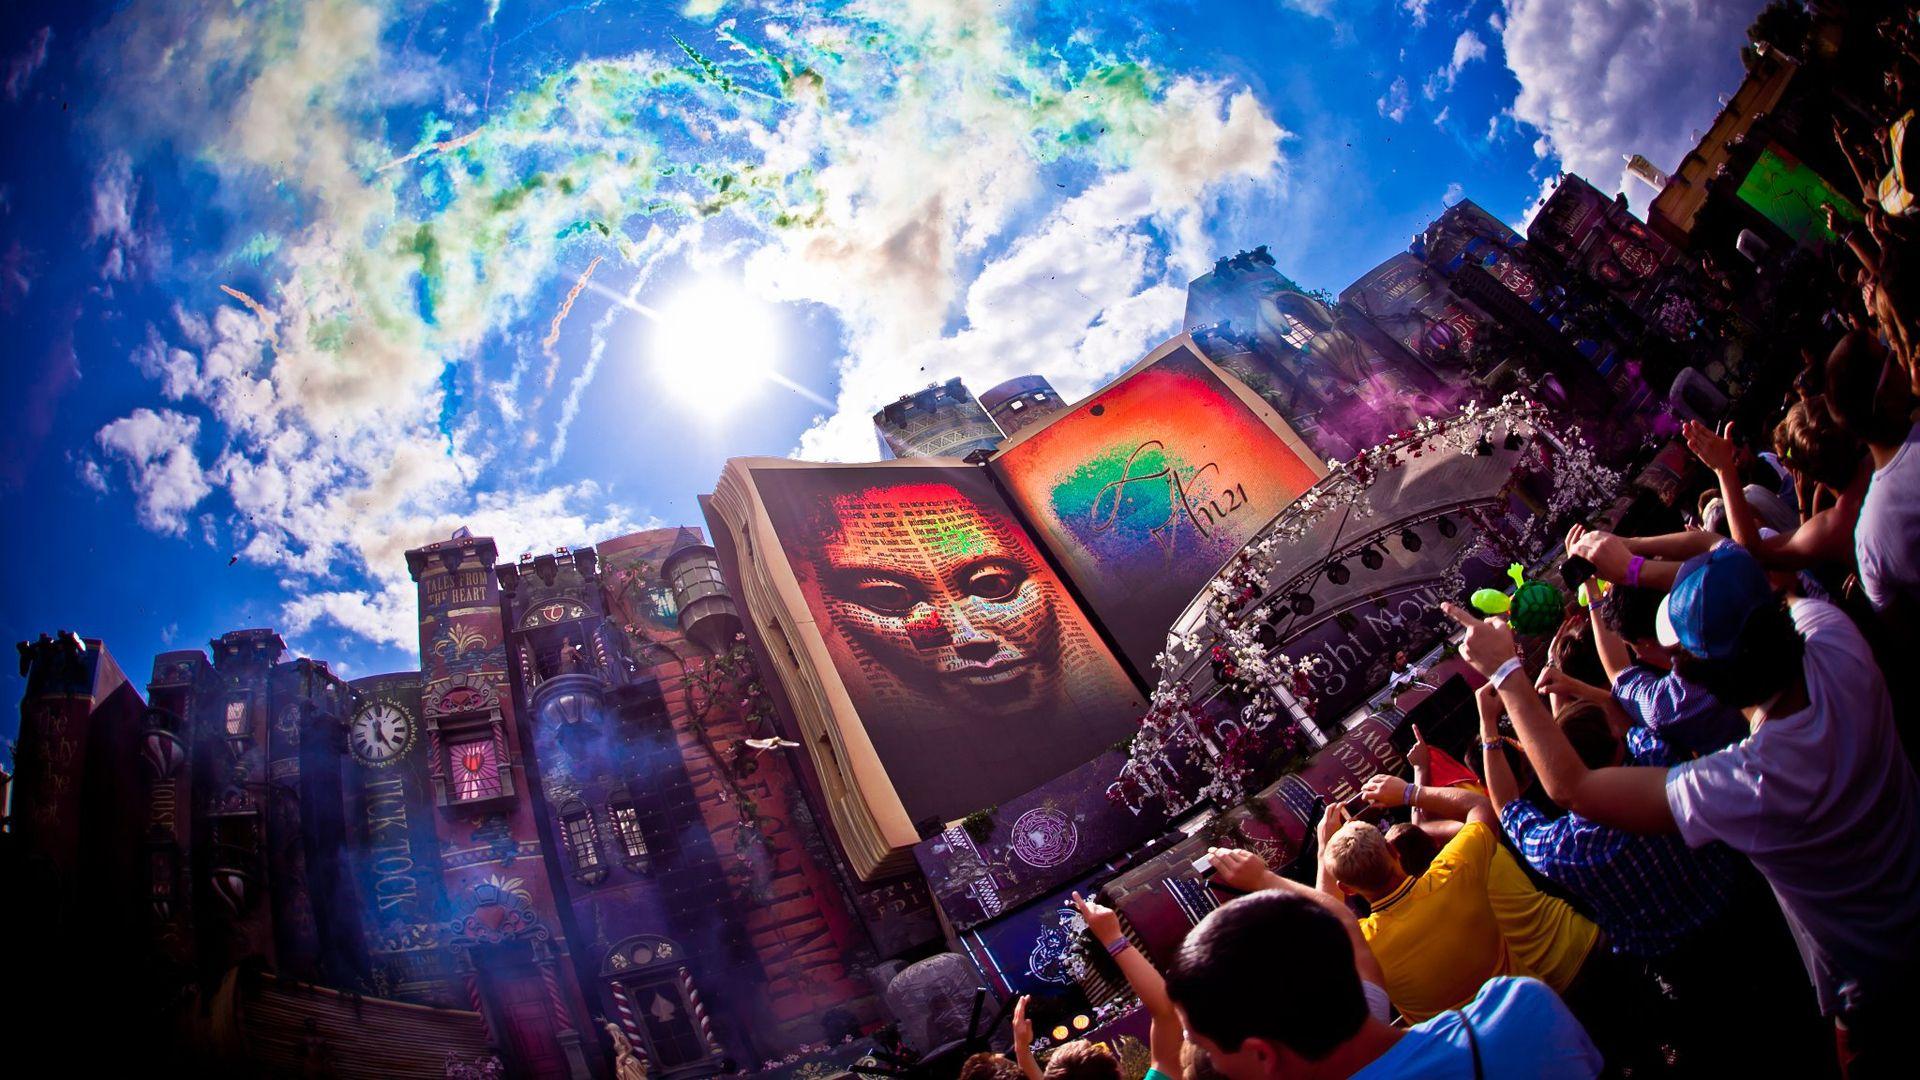 Hardwell I Am Hardwell Music Dj Poster Wallpapers Hd: Tomorrowland Wallpaper #108006